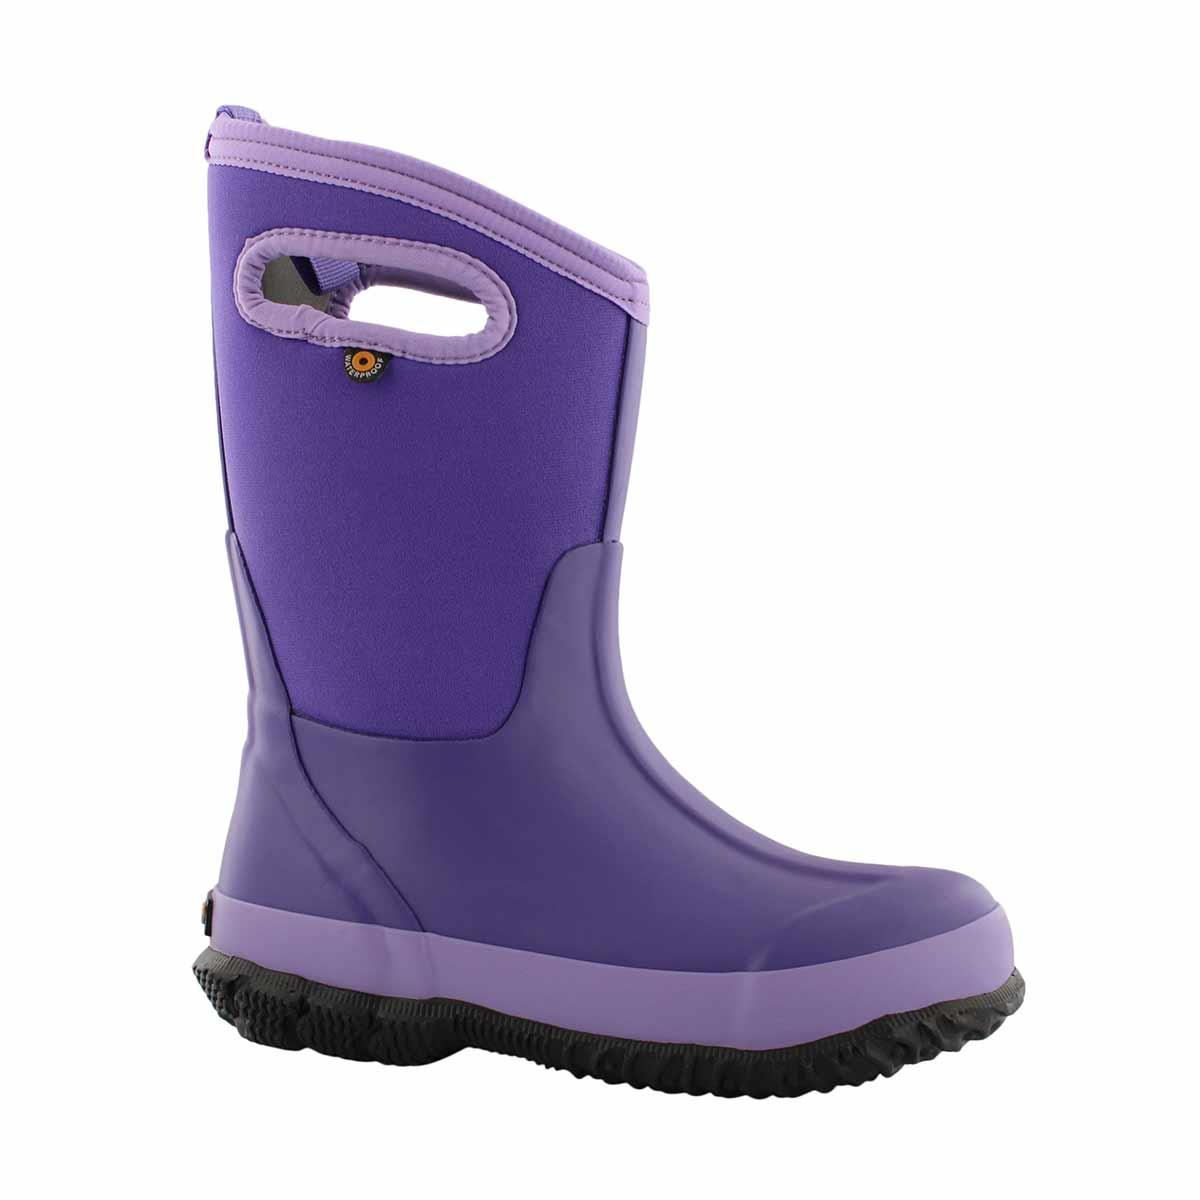 Grls Classic Matte violet wtpf wntr boot